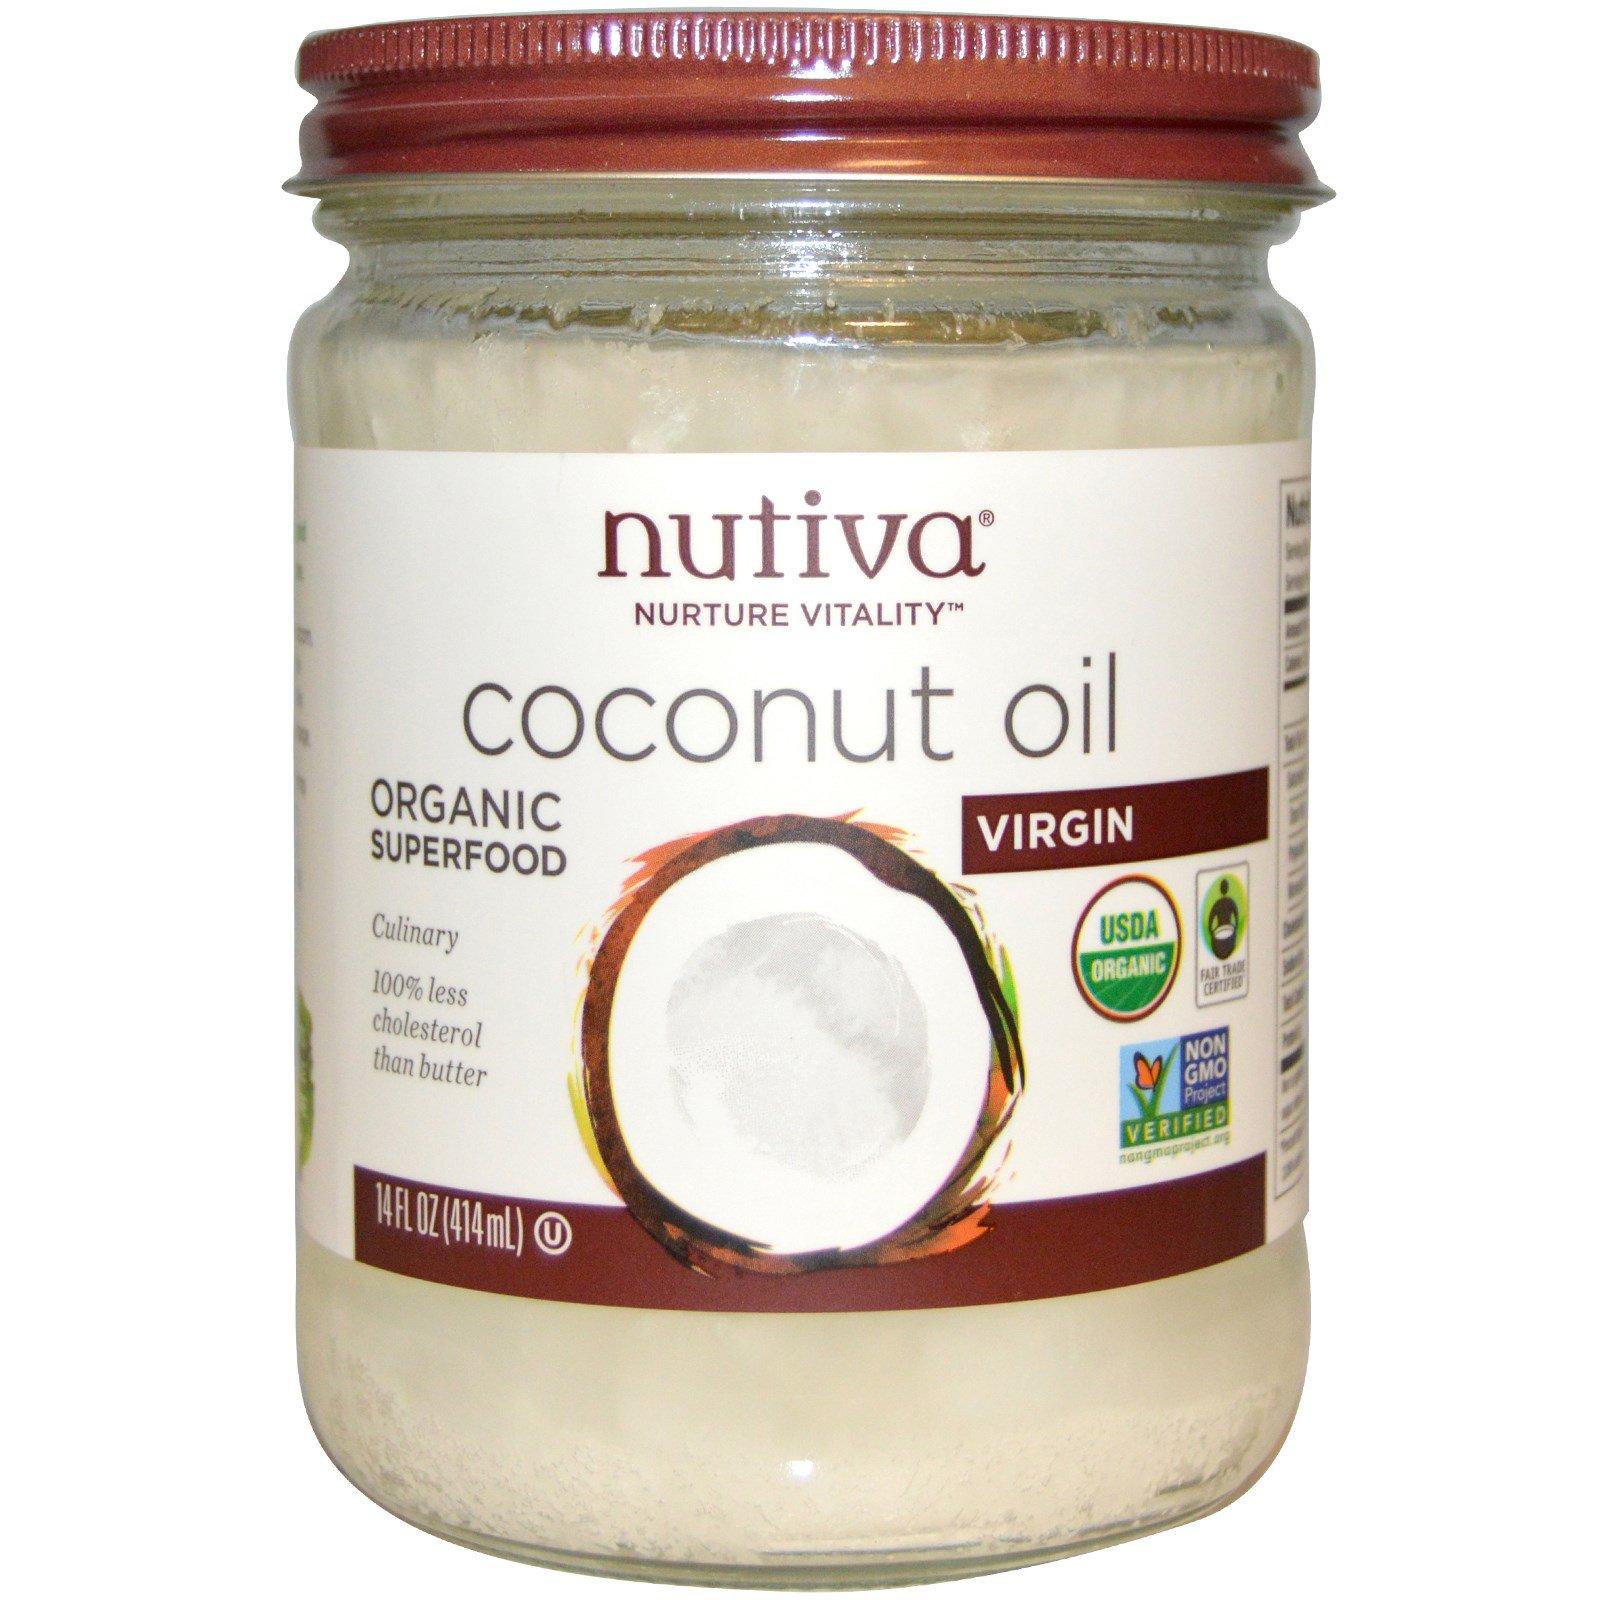 Image result for nutiva coconut oil